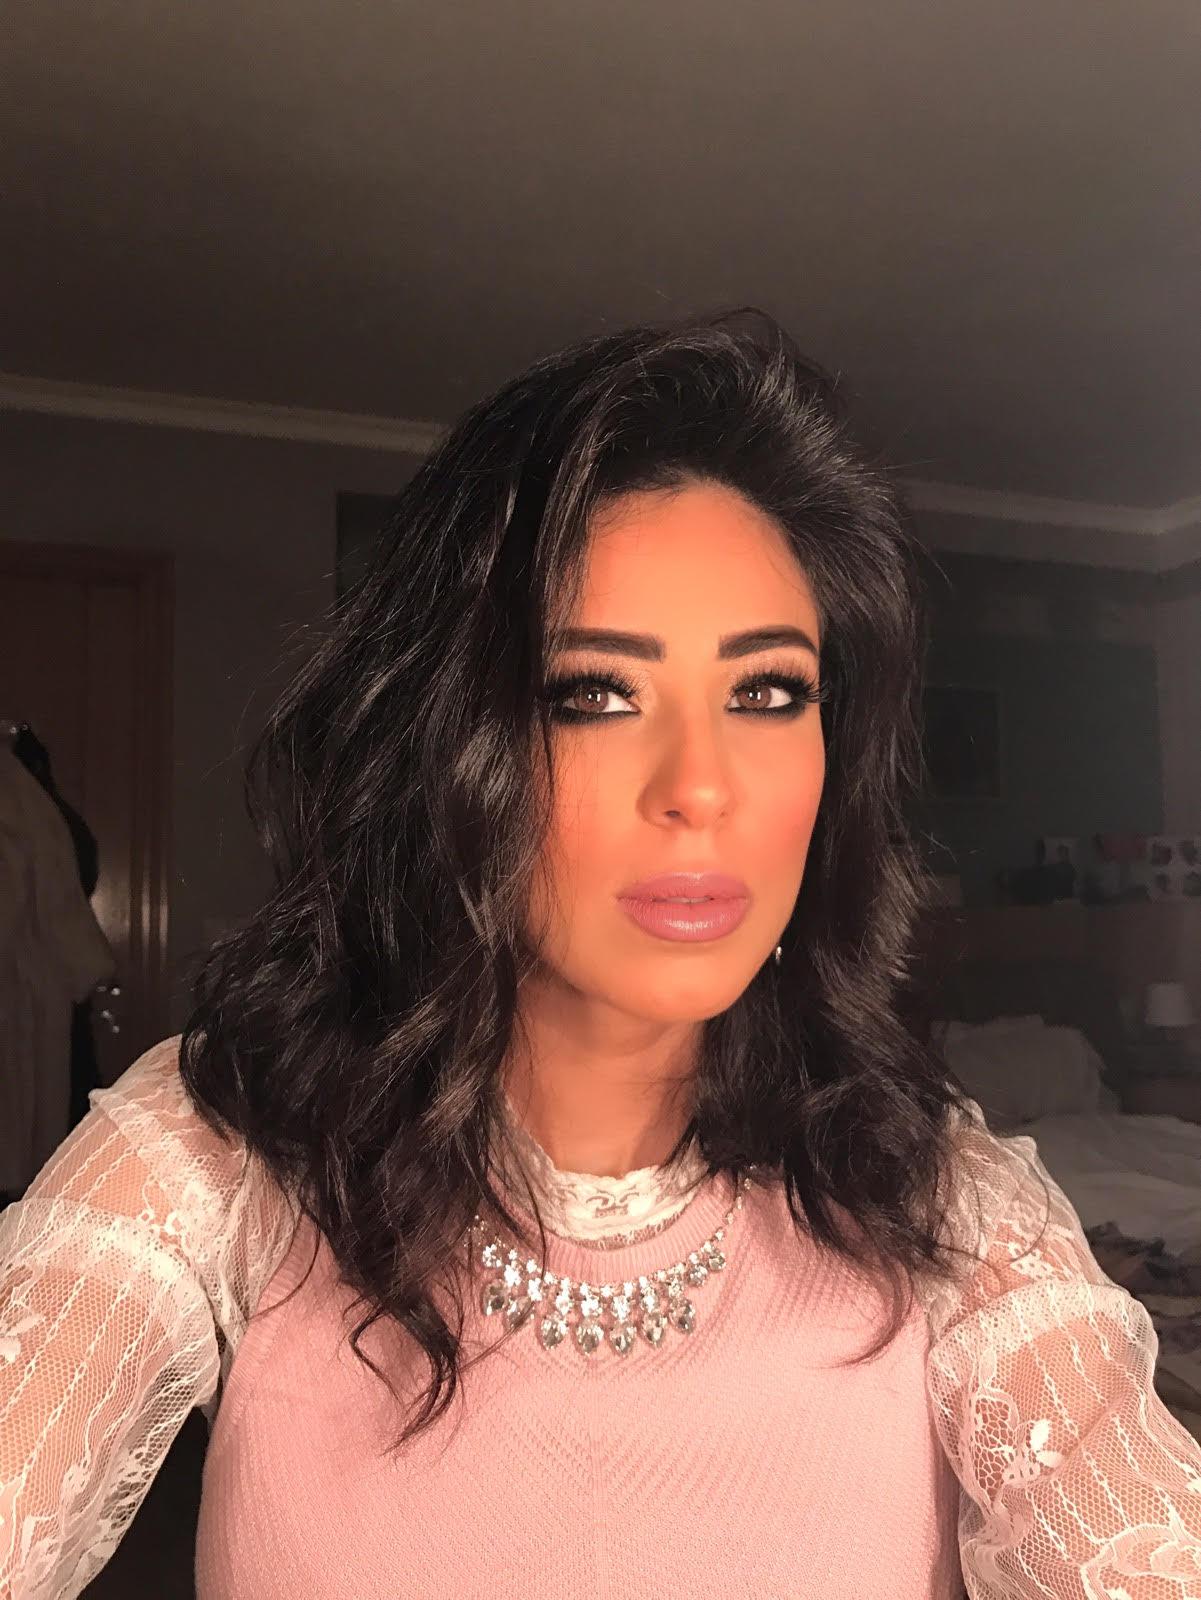 Fustany lifestyle interviews successful egyptian women zeina el naggar